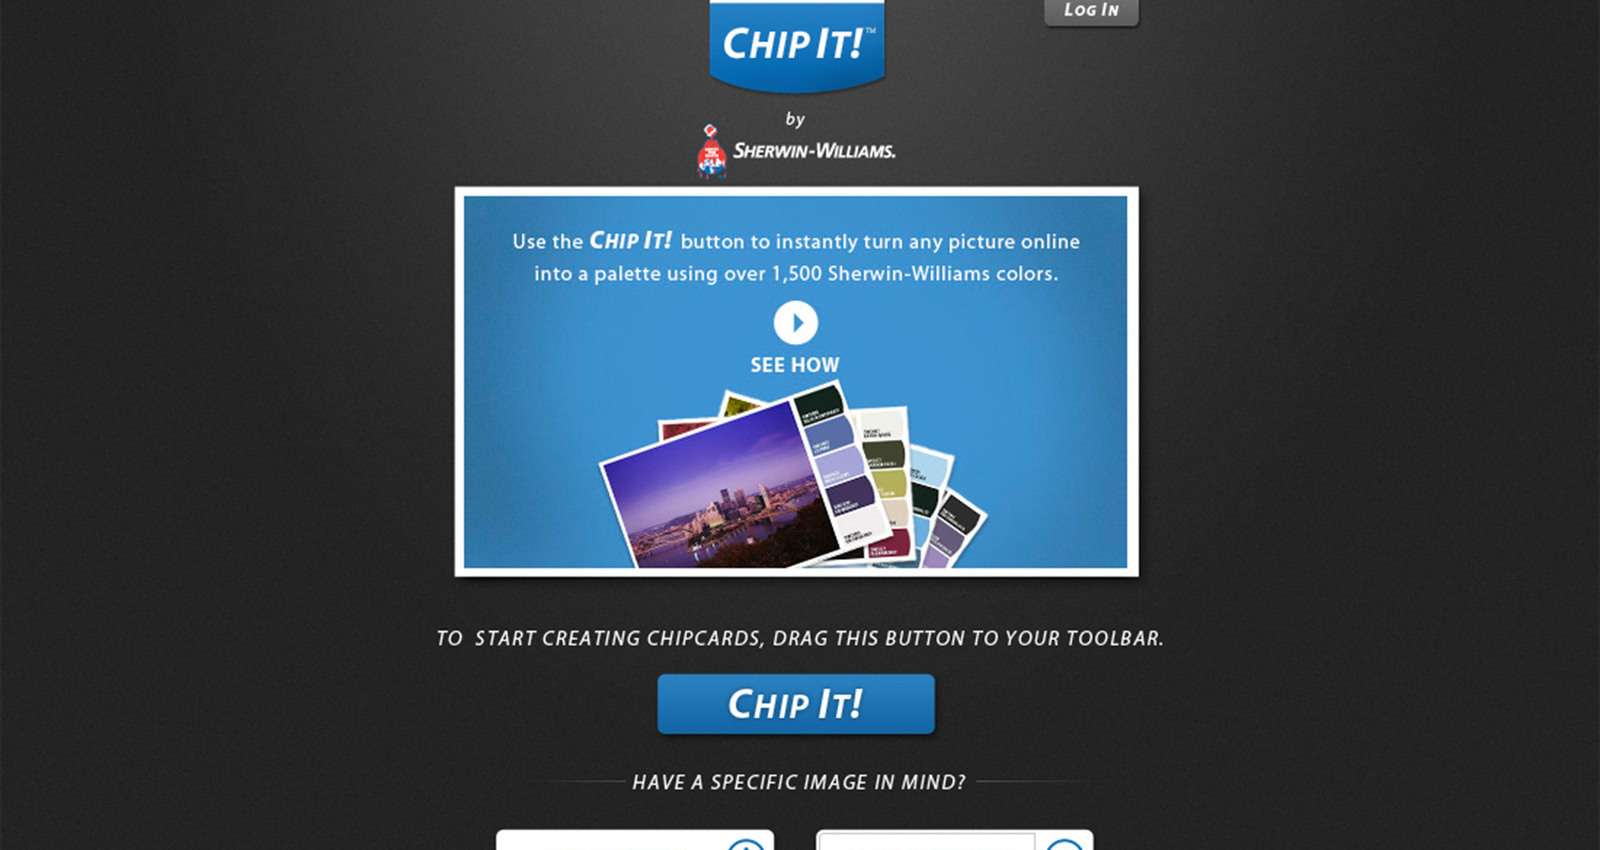 Chip It!